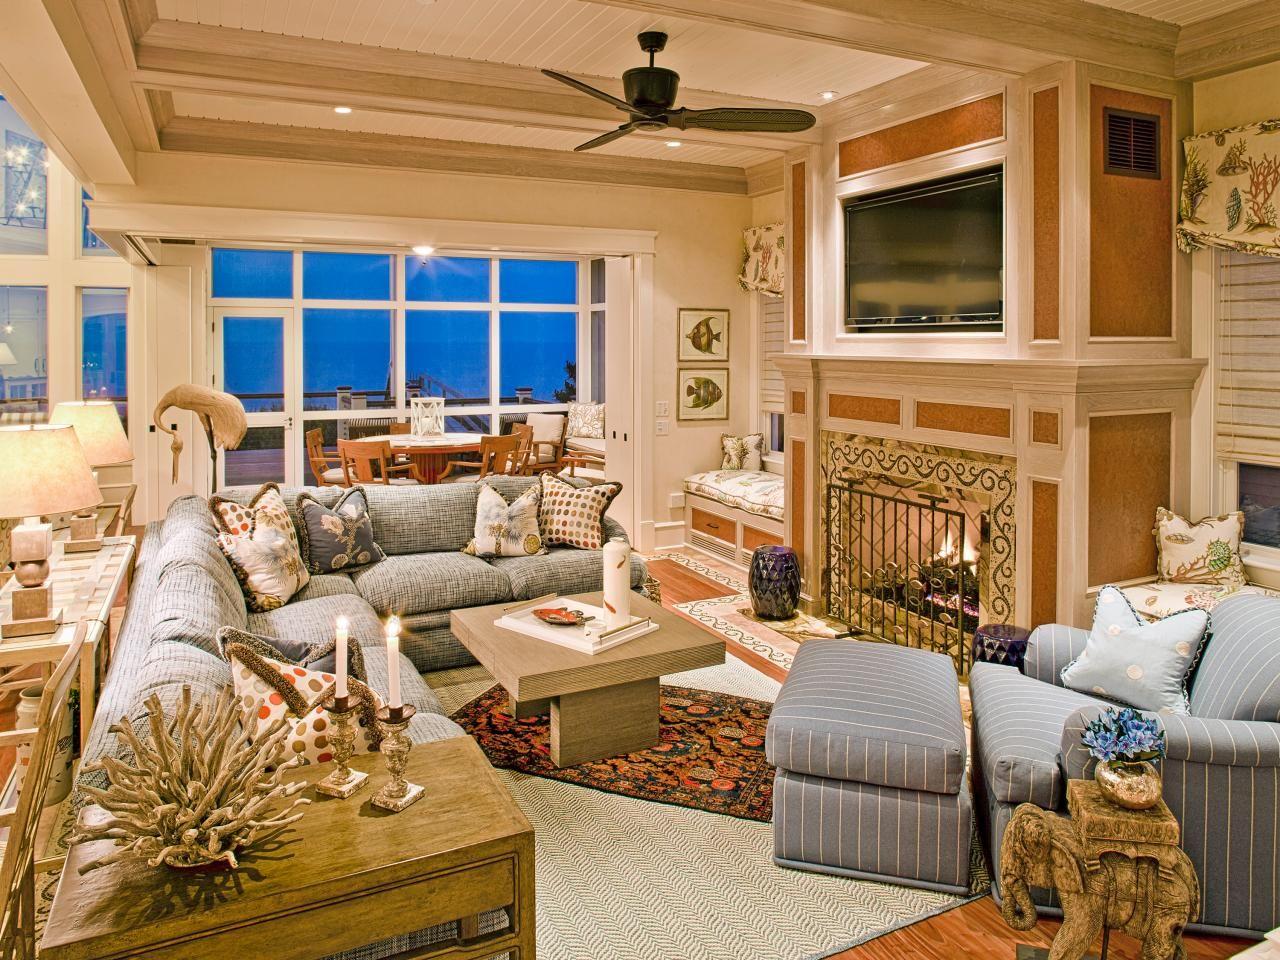 Hgtv Design Ideas Living Room Coastal Living Room Ideas  Window Seat Cushions Coastal And